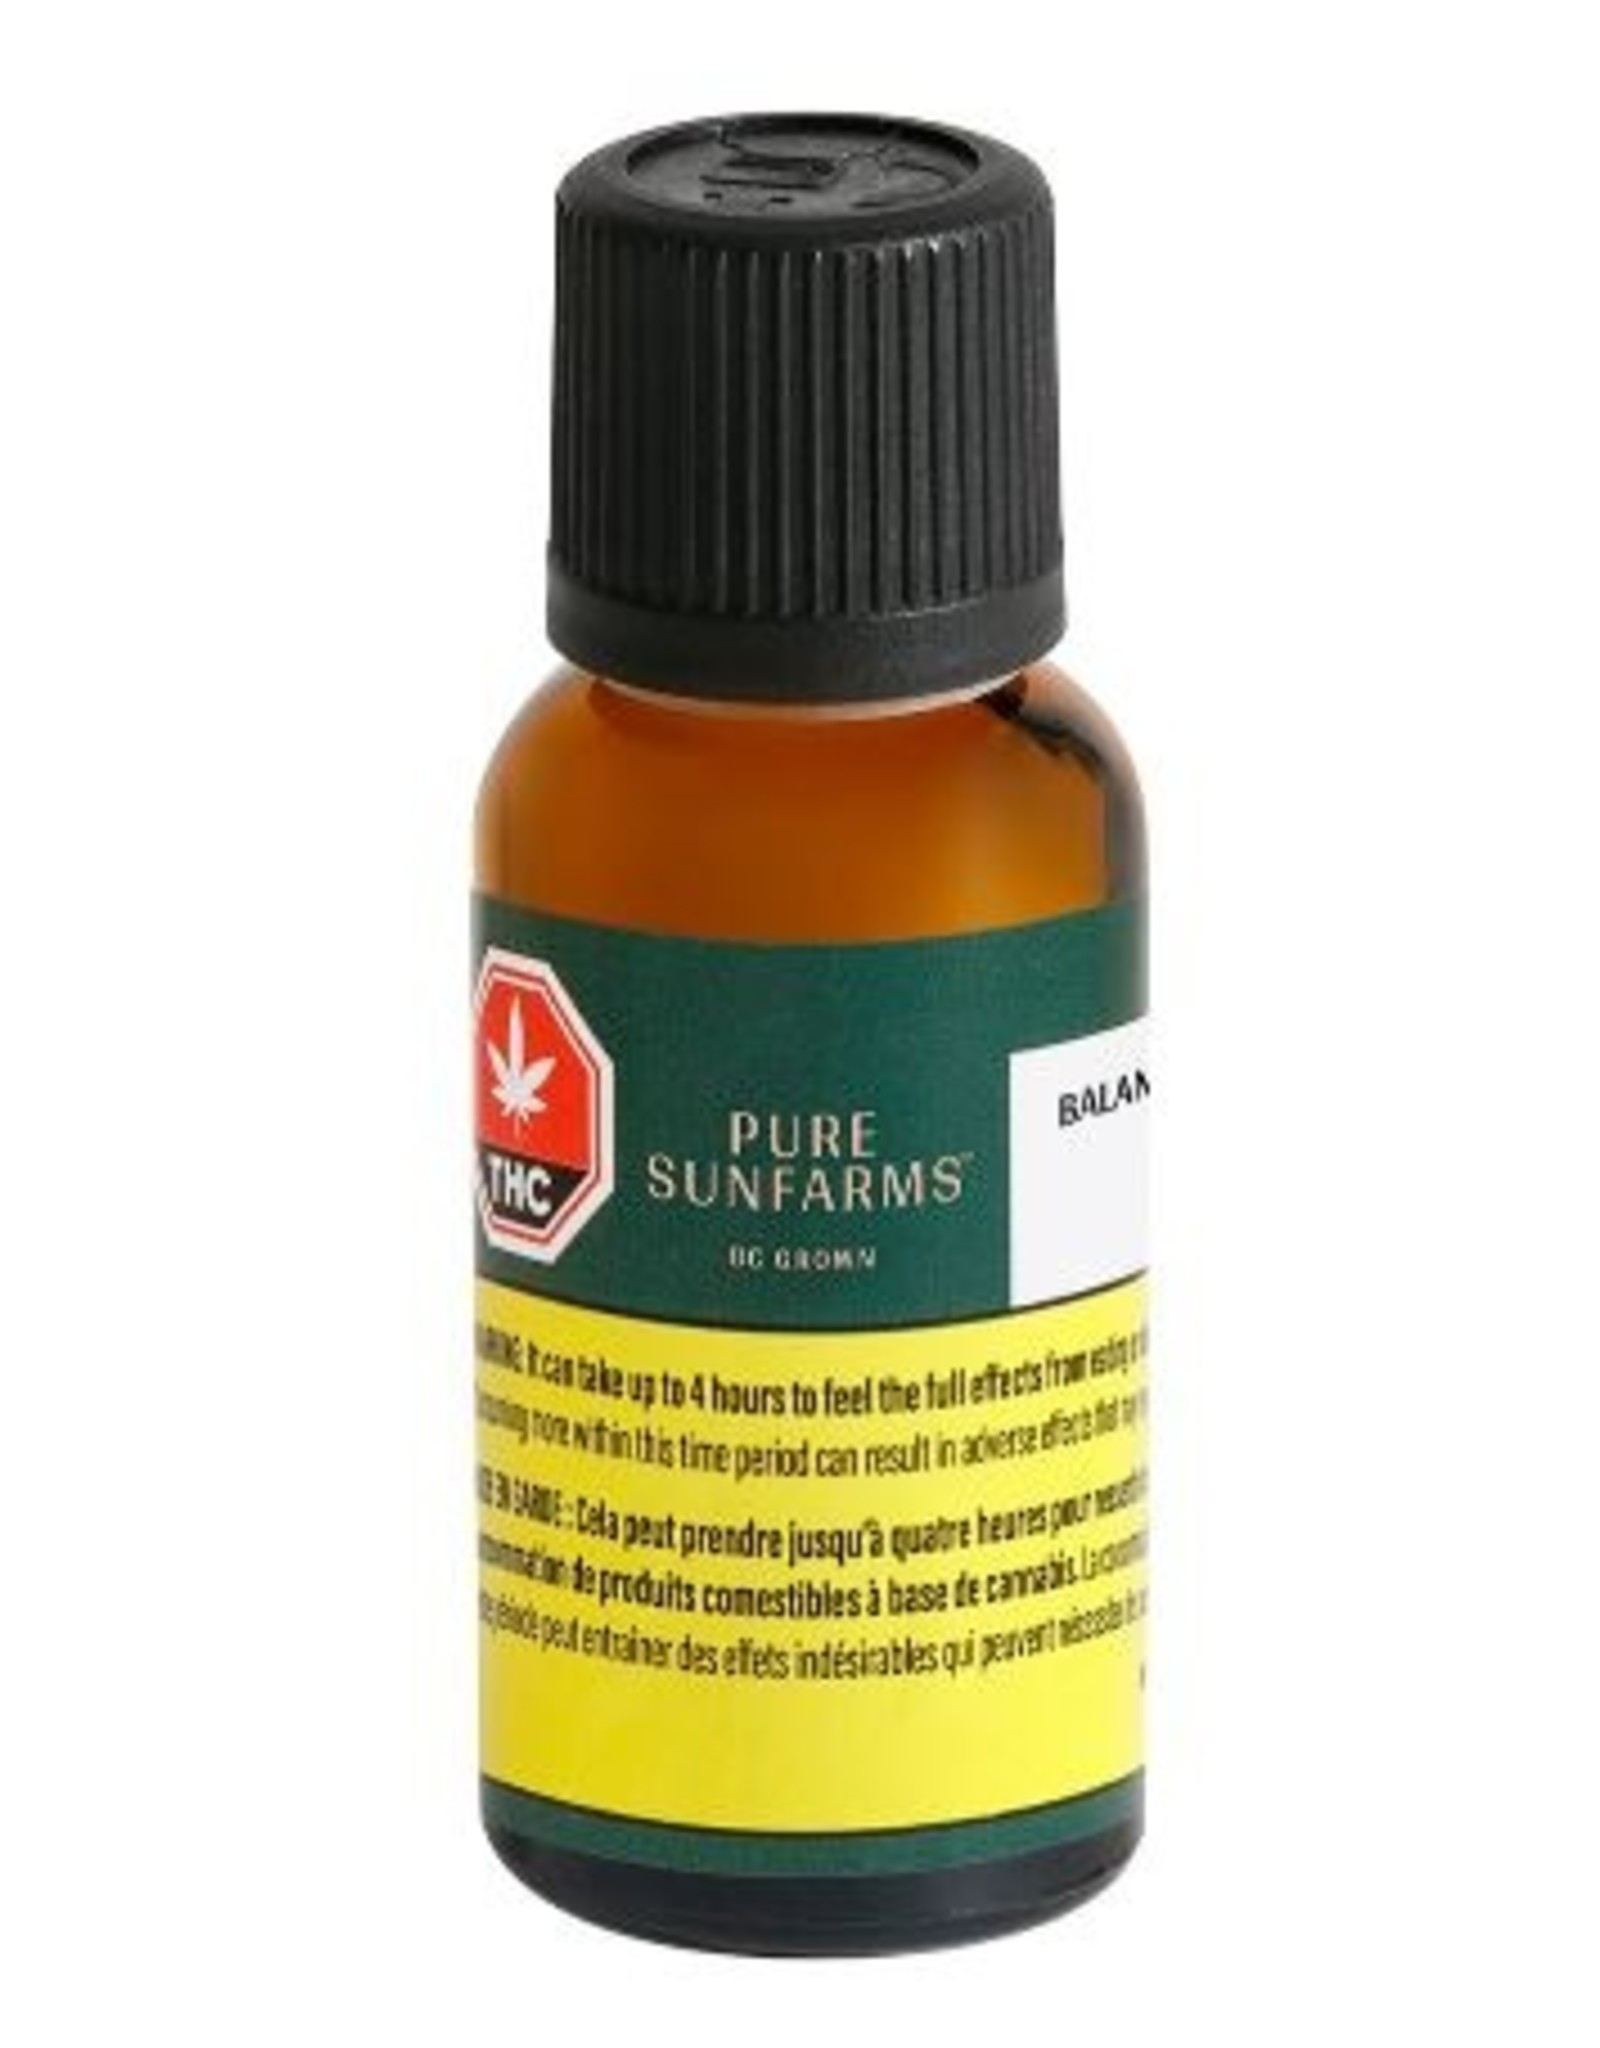 Pure Sunfarms Pure Sunfarms - Balance 15 Oil